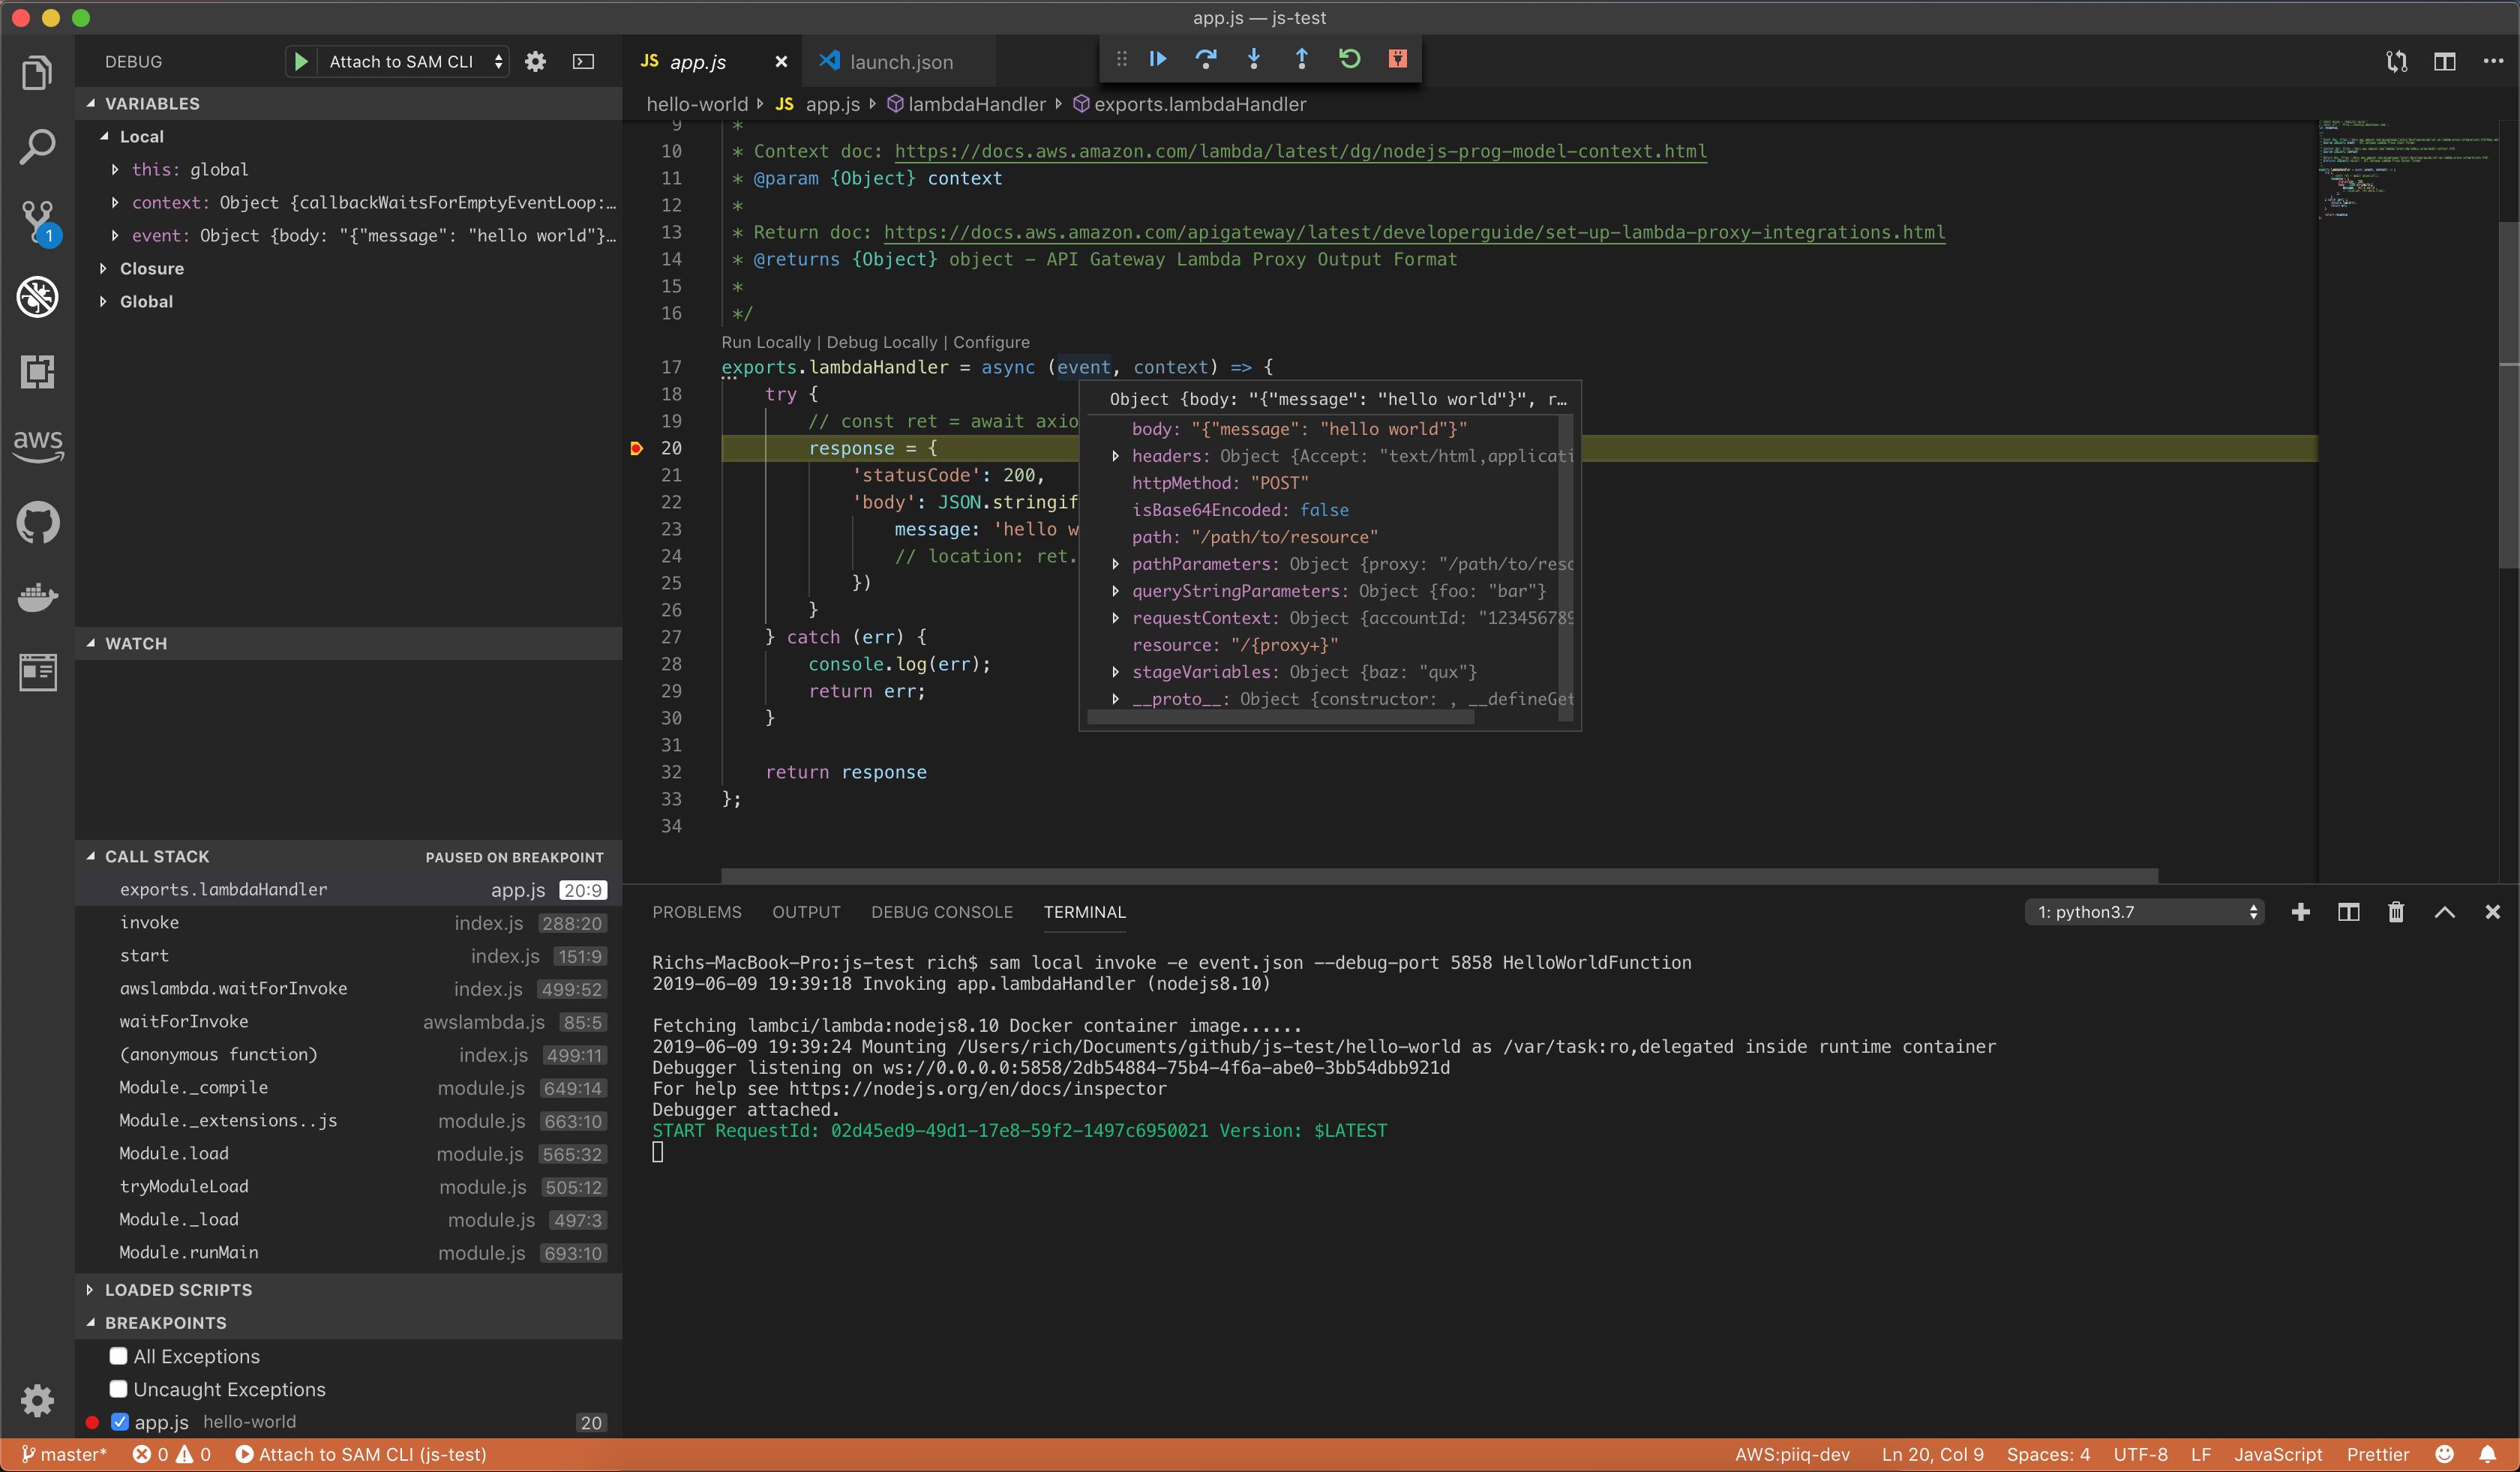 VS Code running in debugging mode